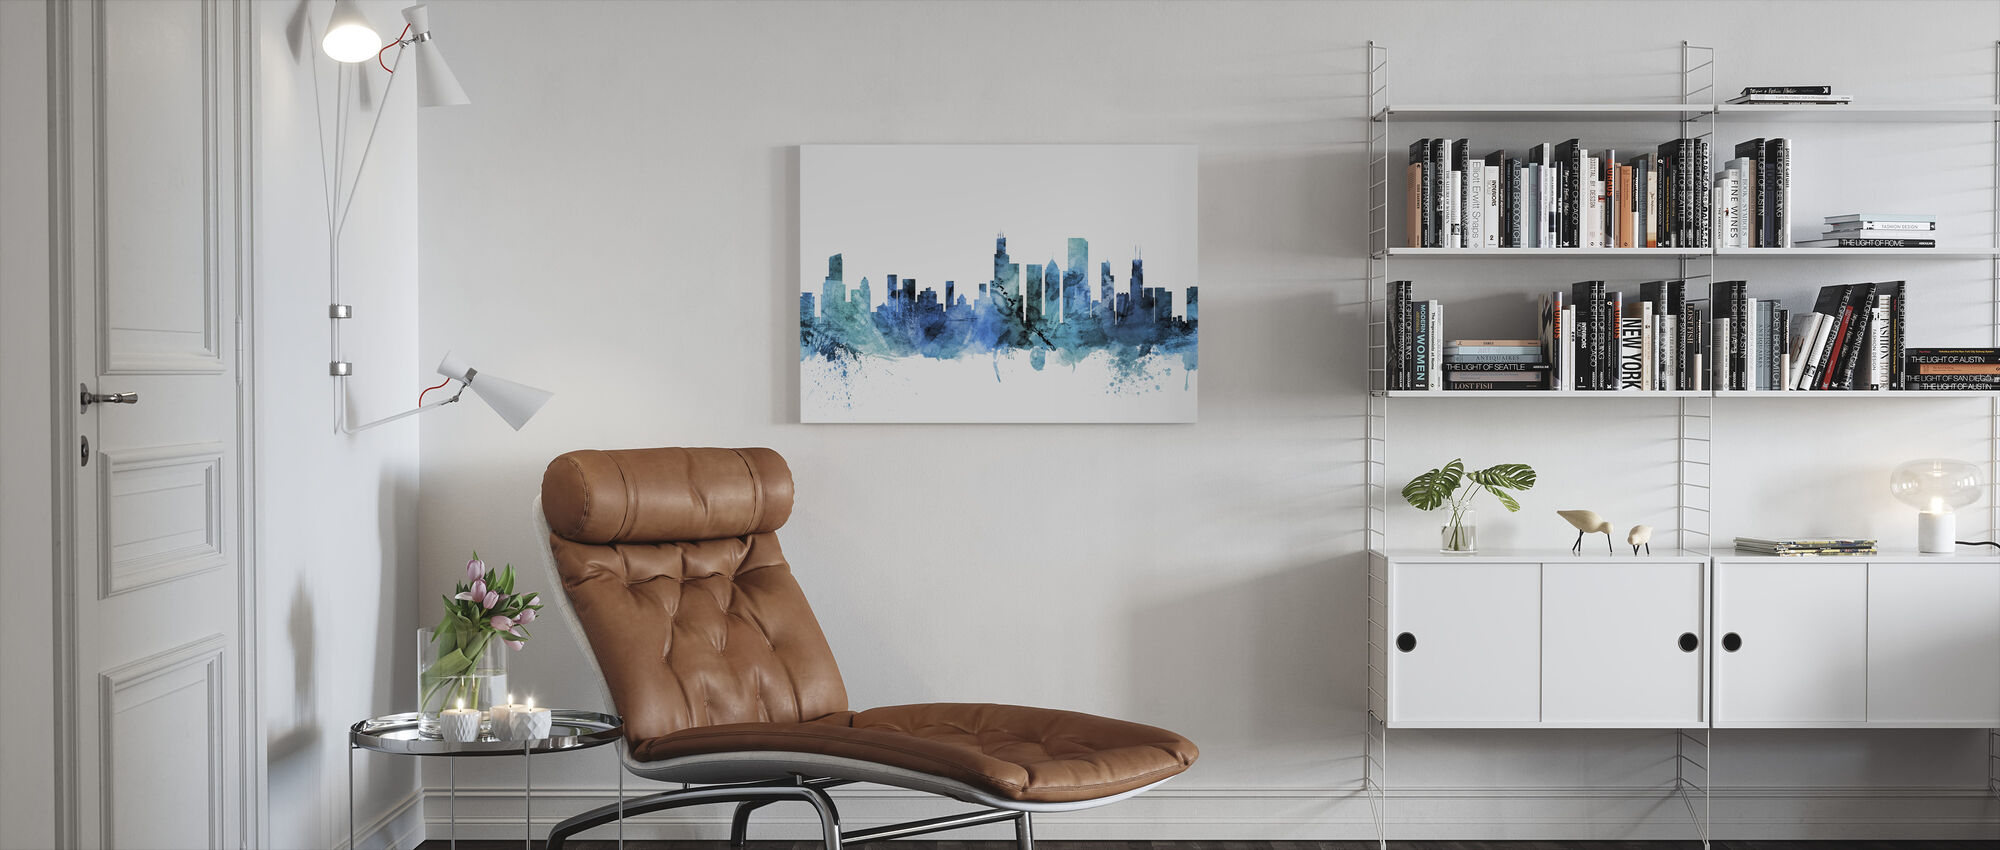 Chicago Illinois Skyline - Canvas print - Living Room